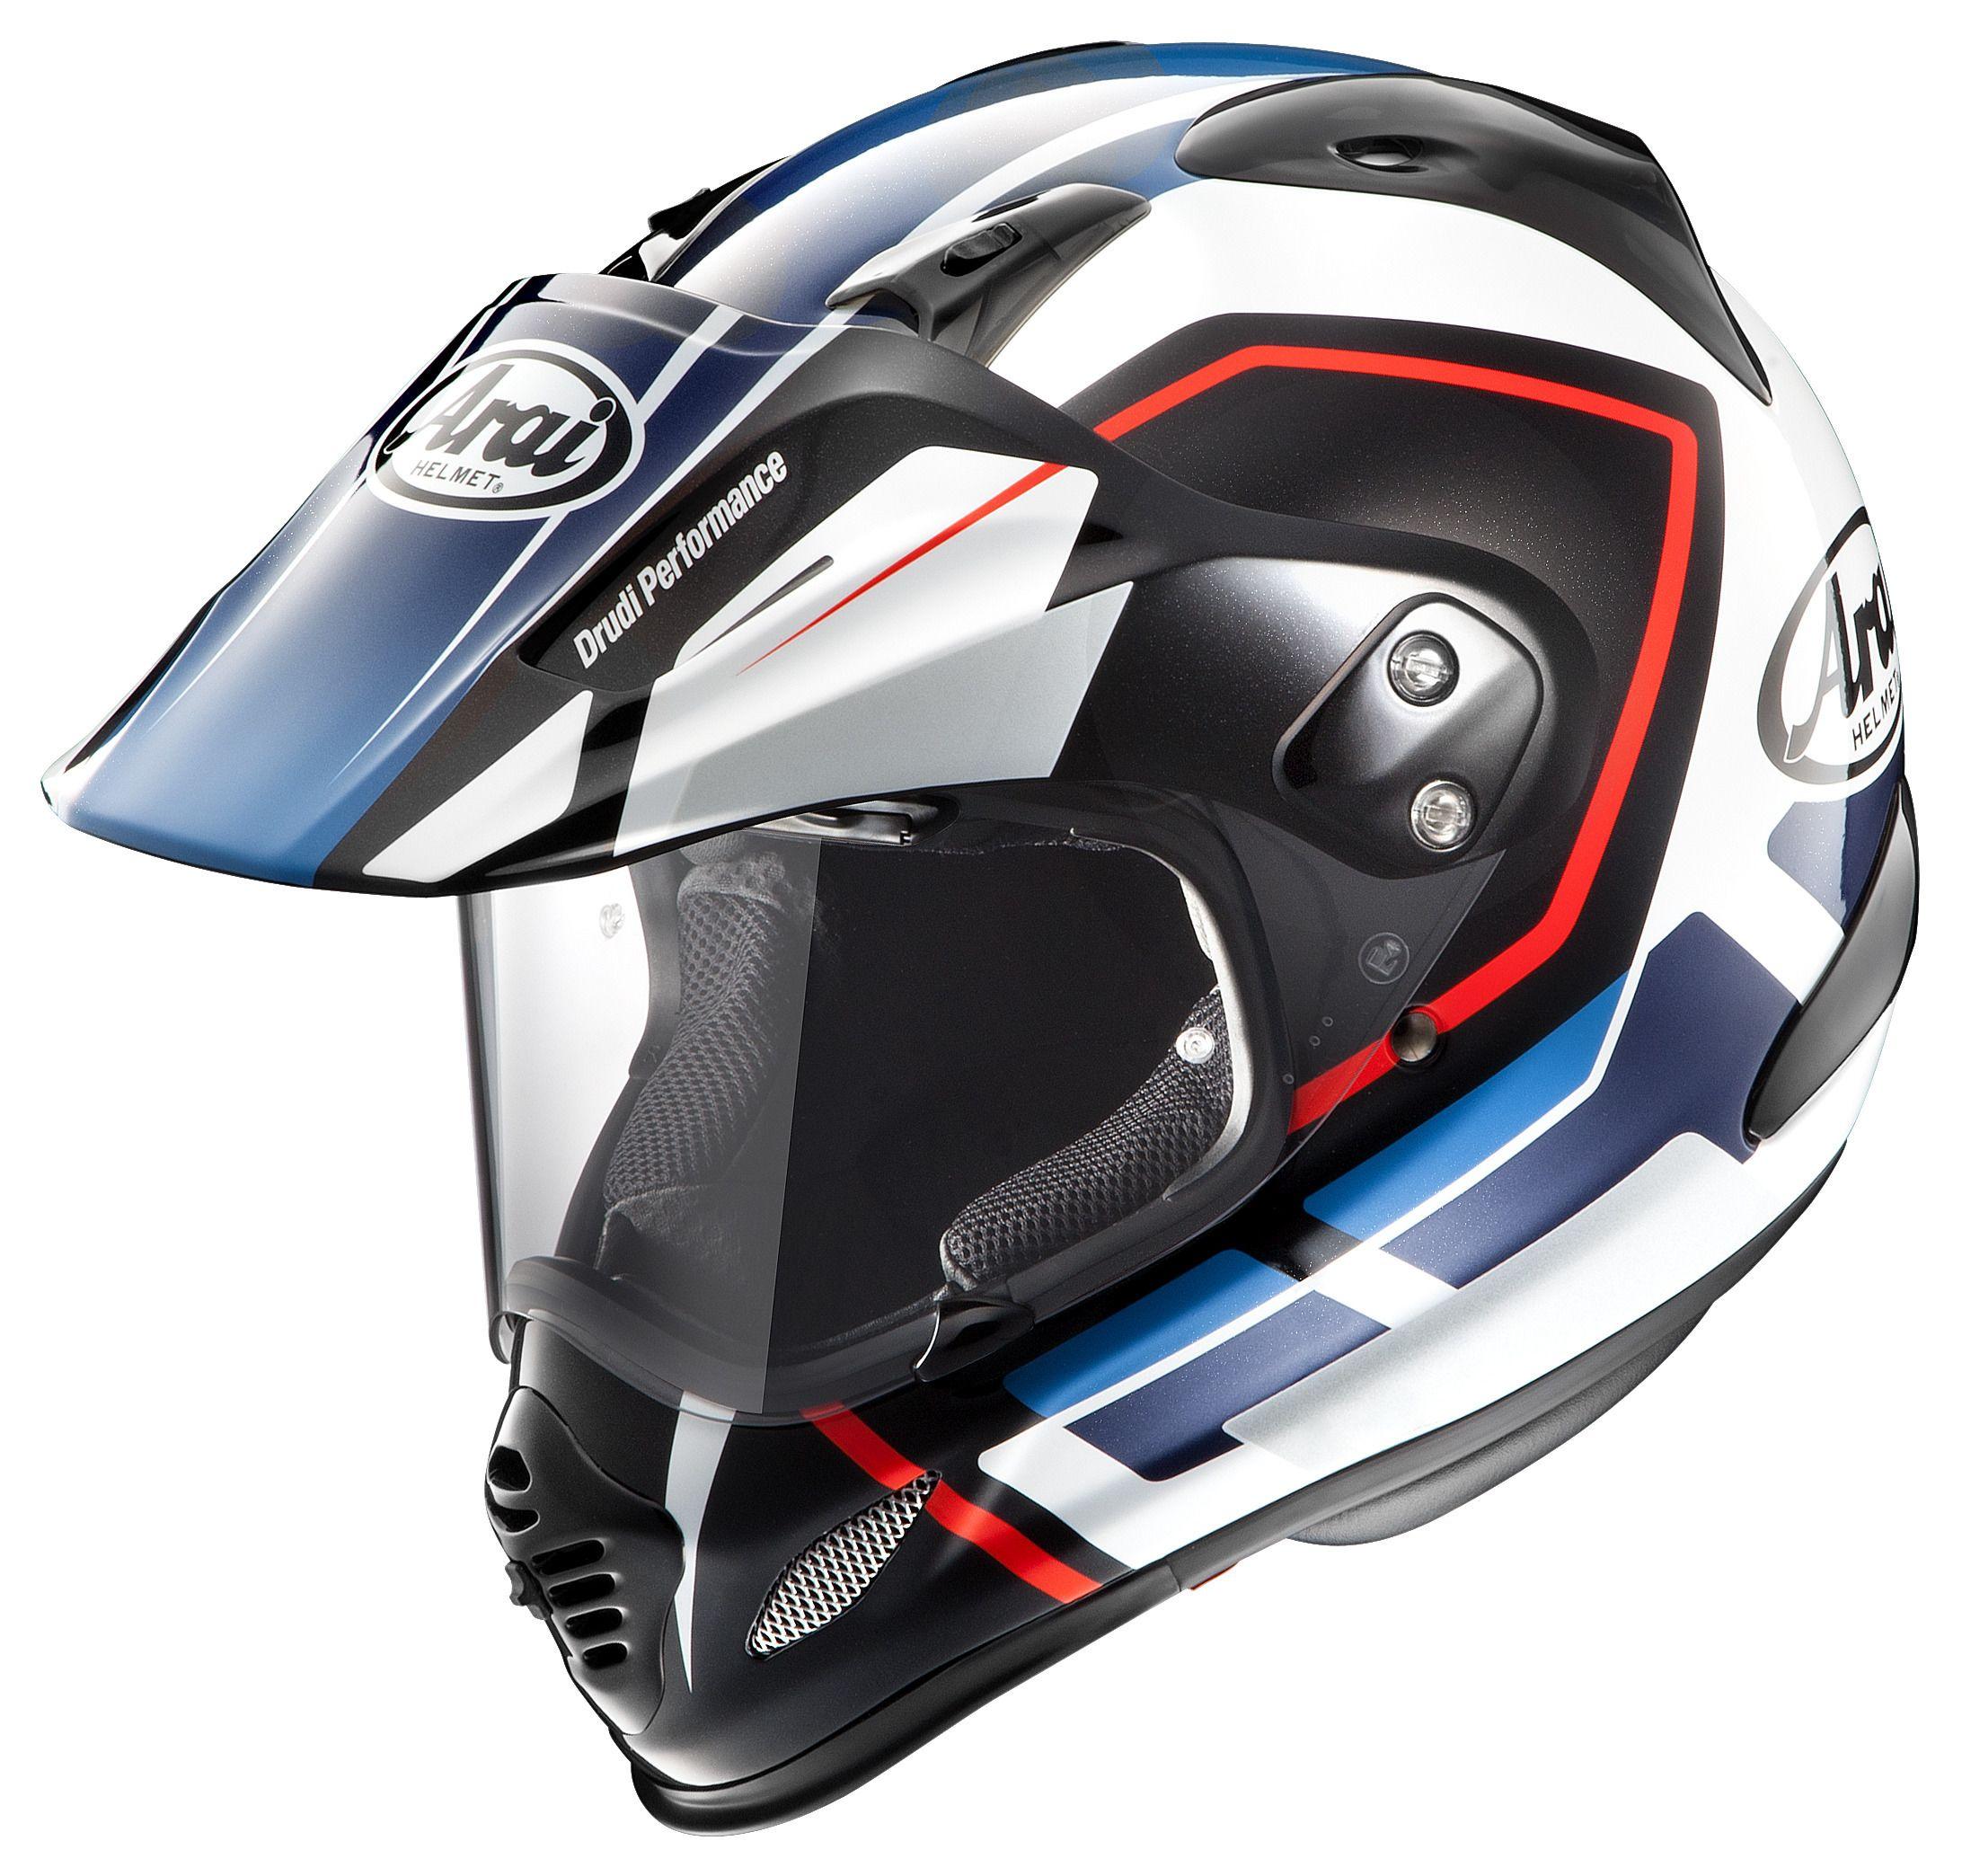 Arai XD-4 Helmet Review: Dual Sports Helmet With Advanced